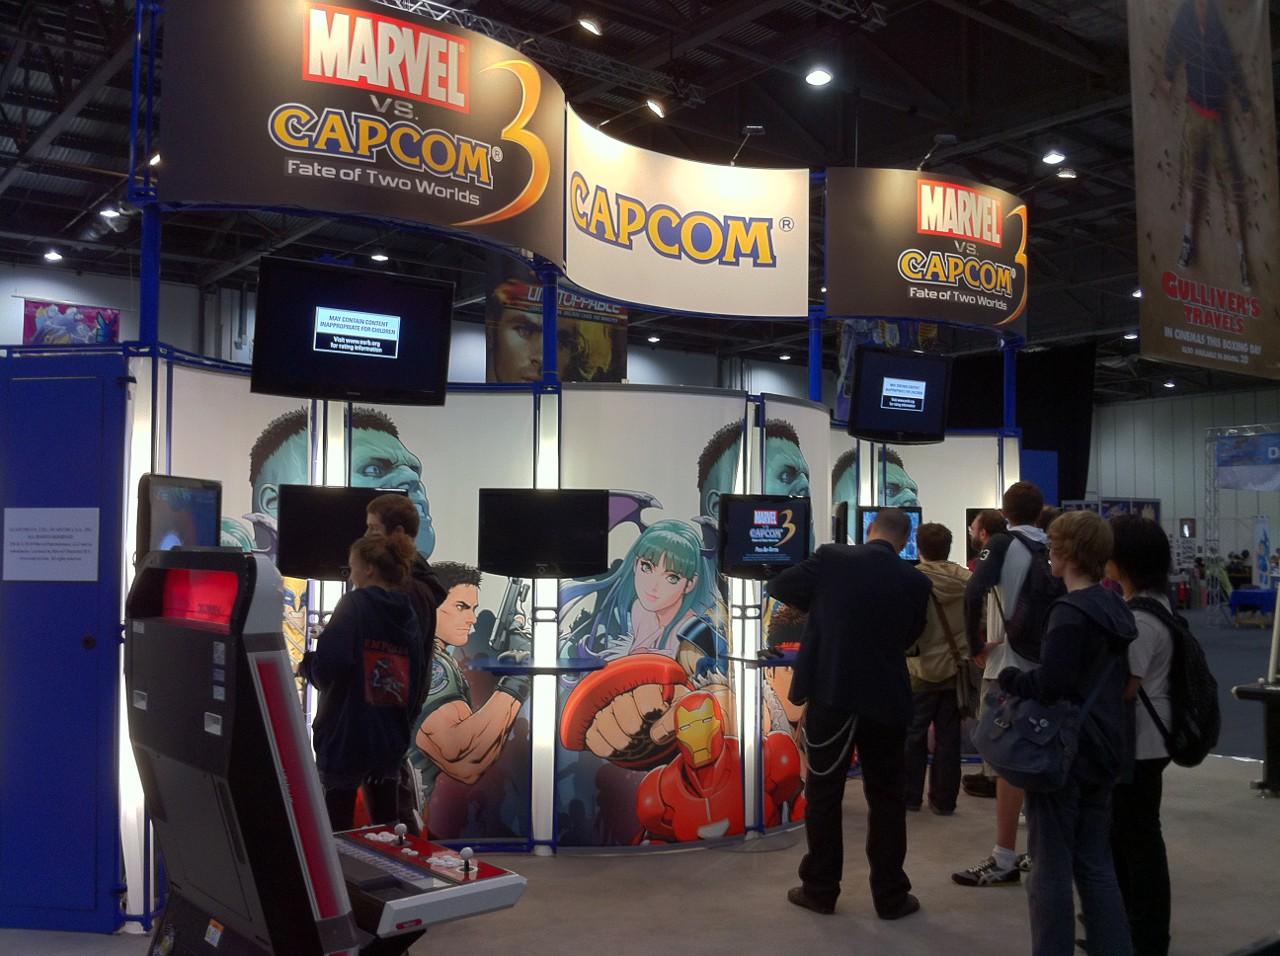 MarvelVsCapcom3